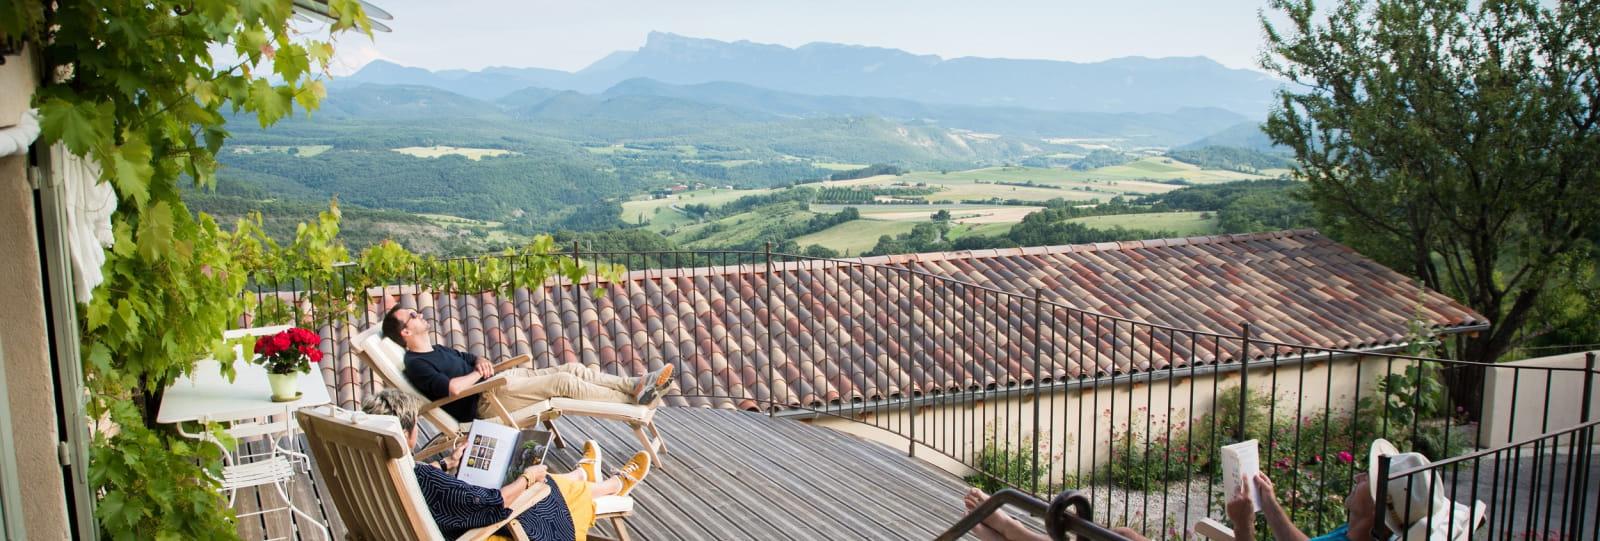 Gite l'Amandier - terrasse